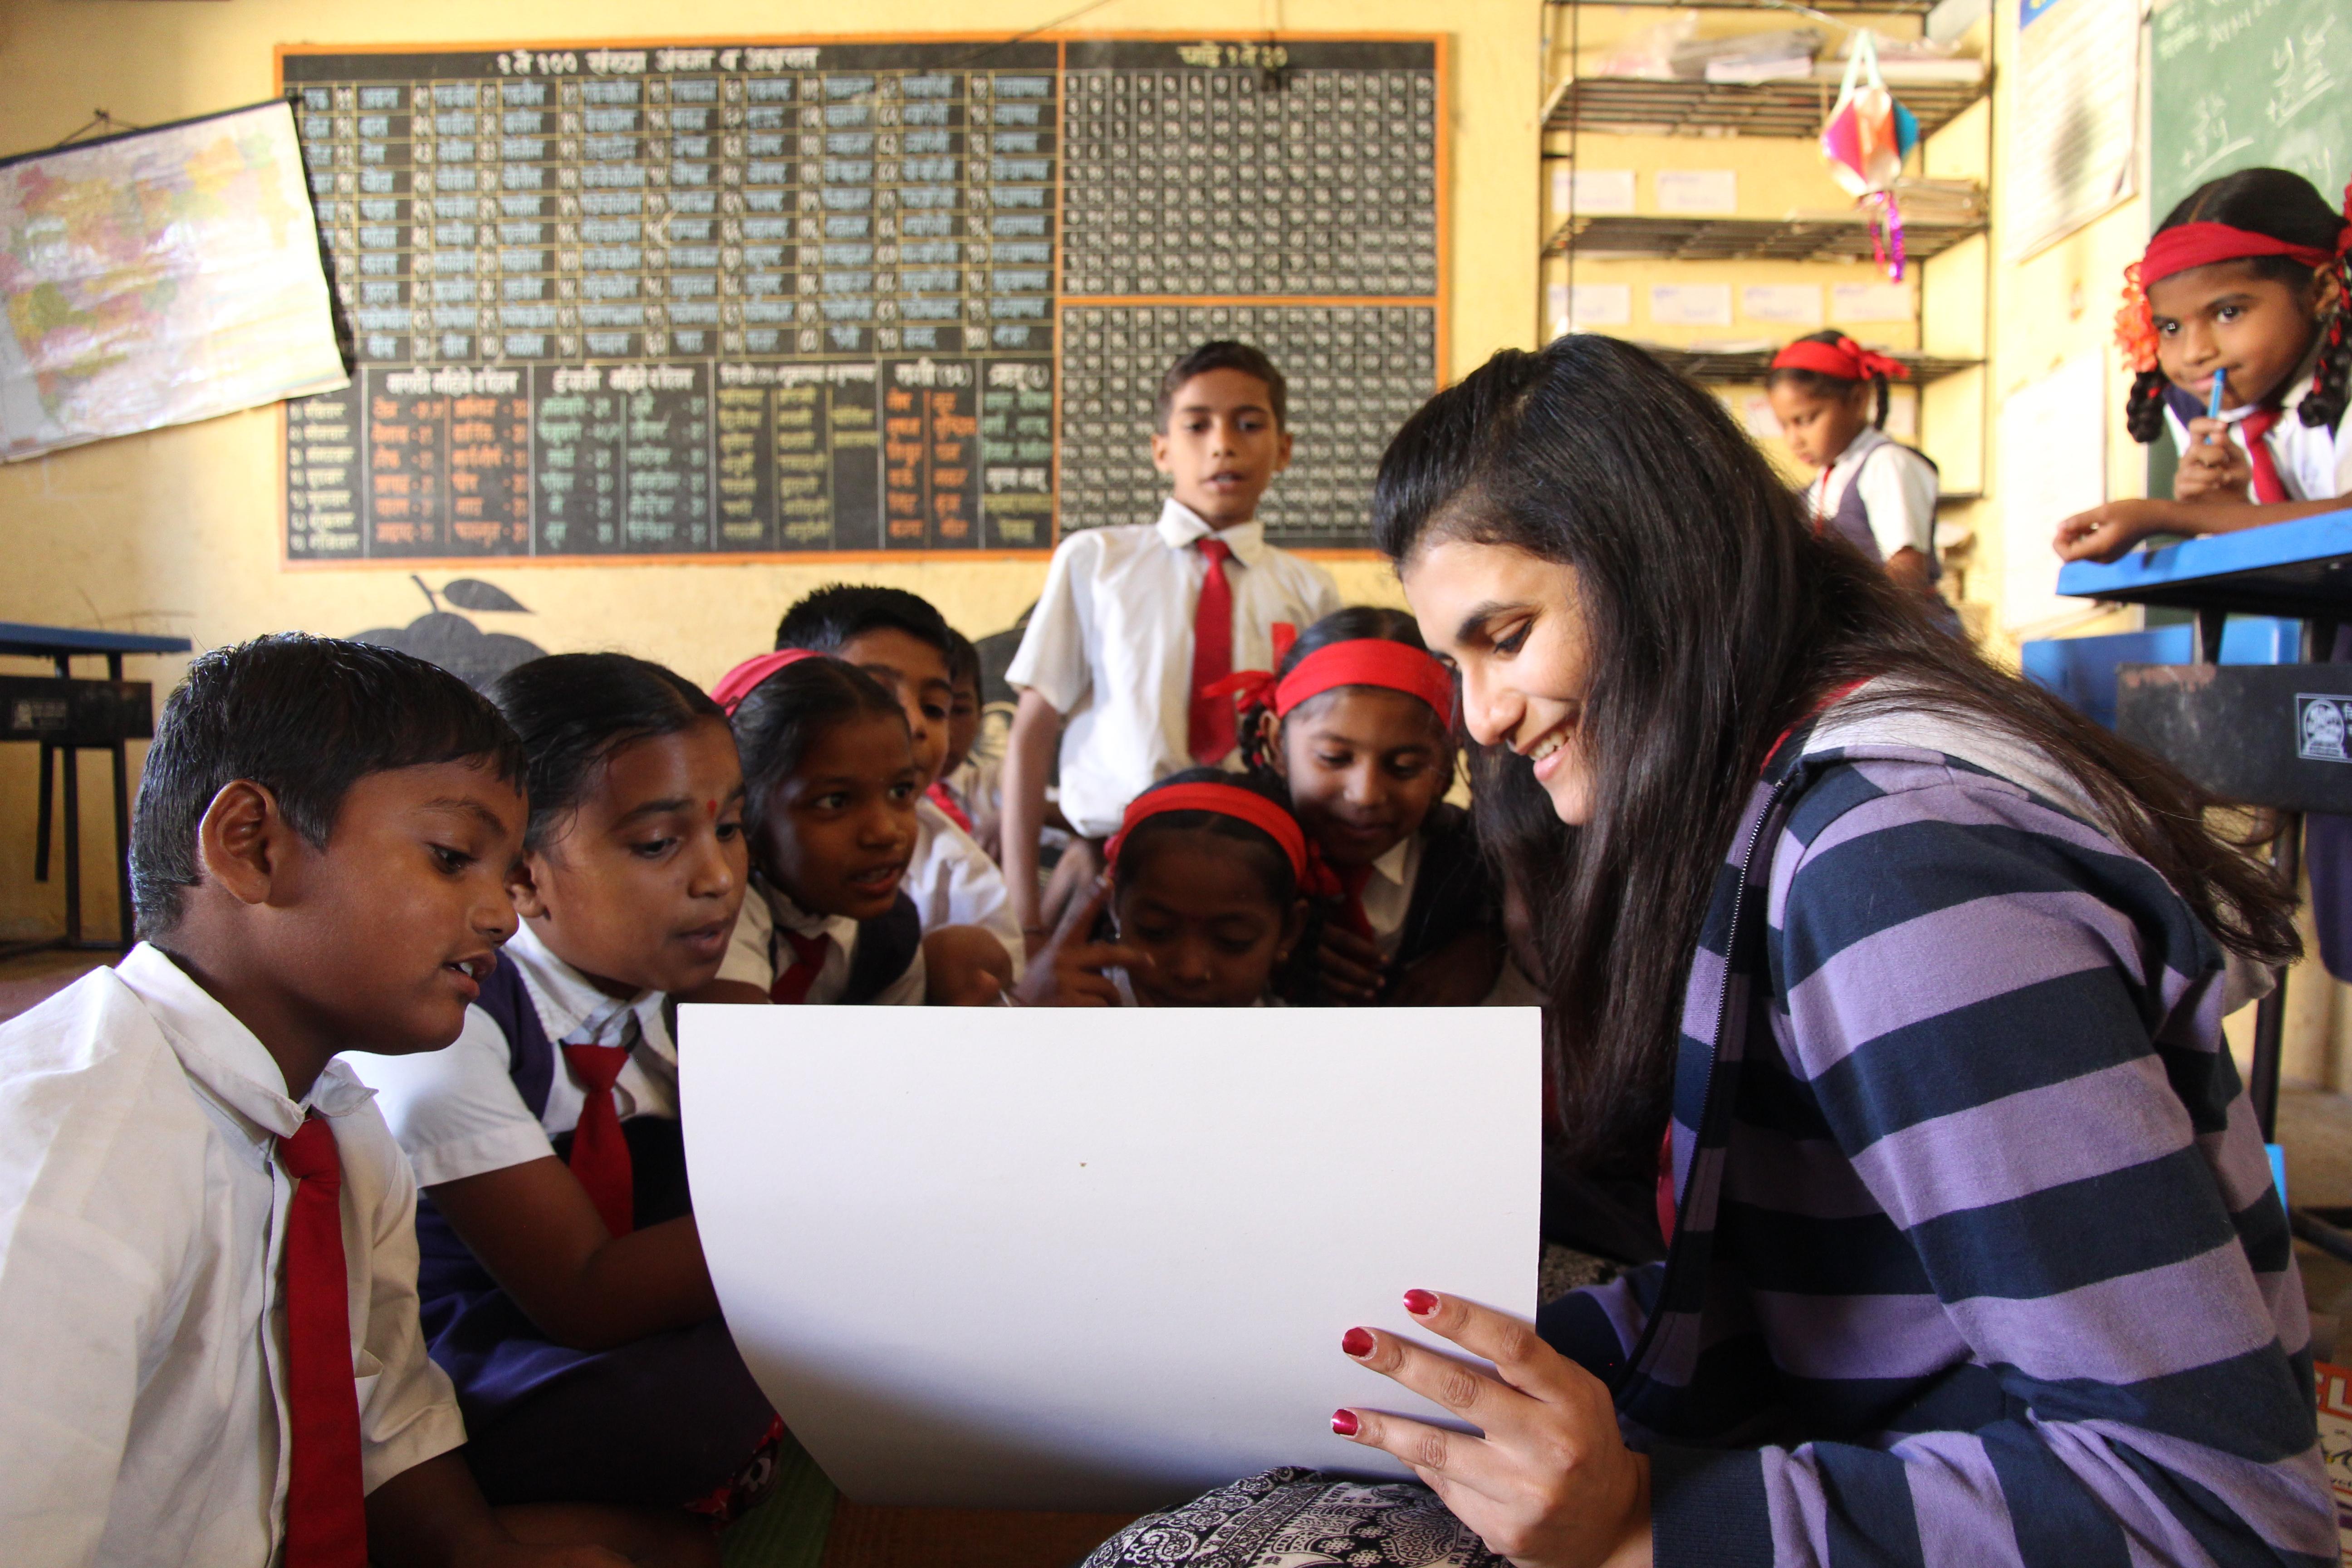 Saniya reading to group of children